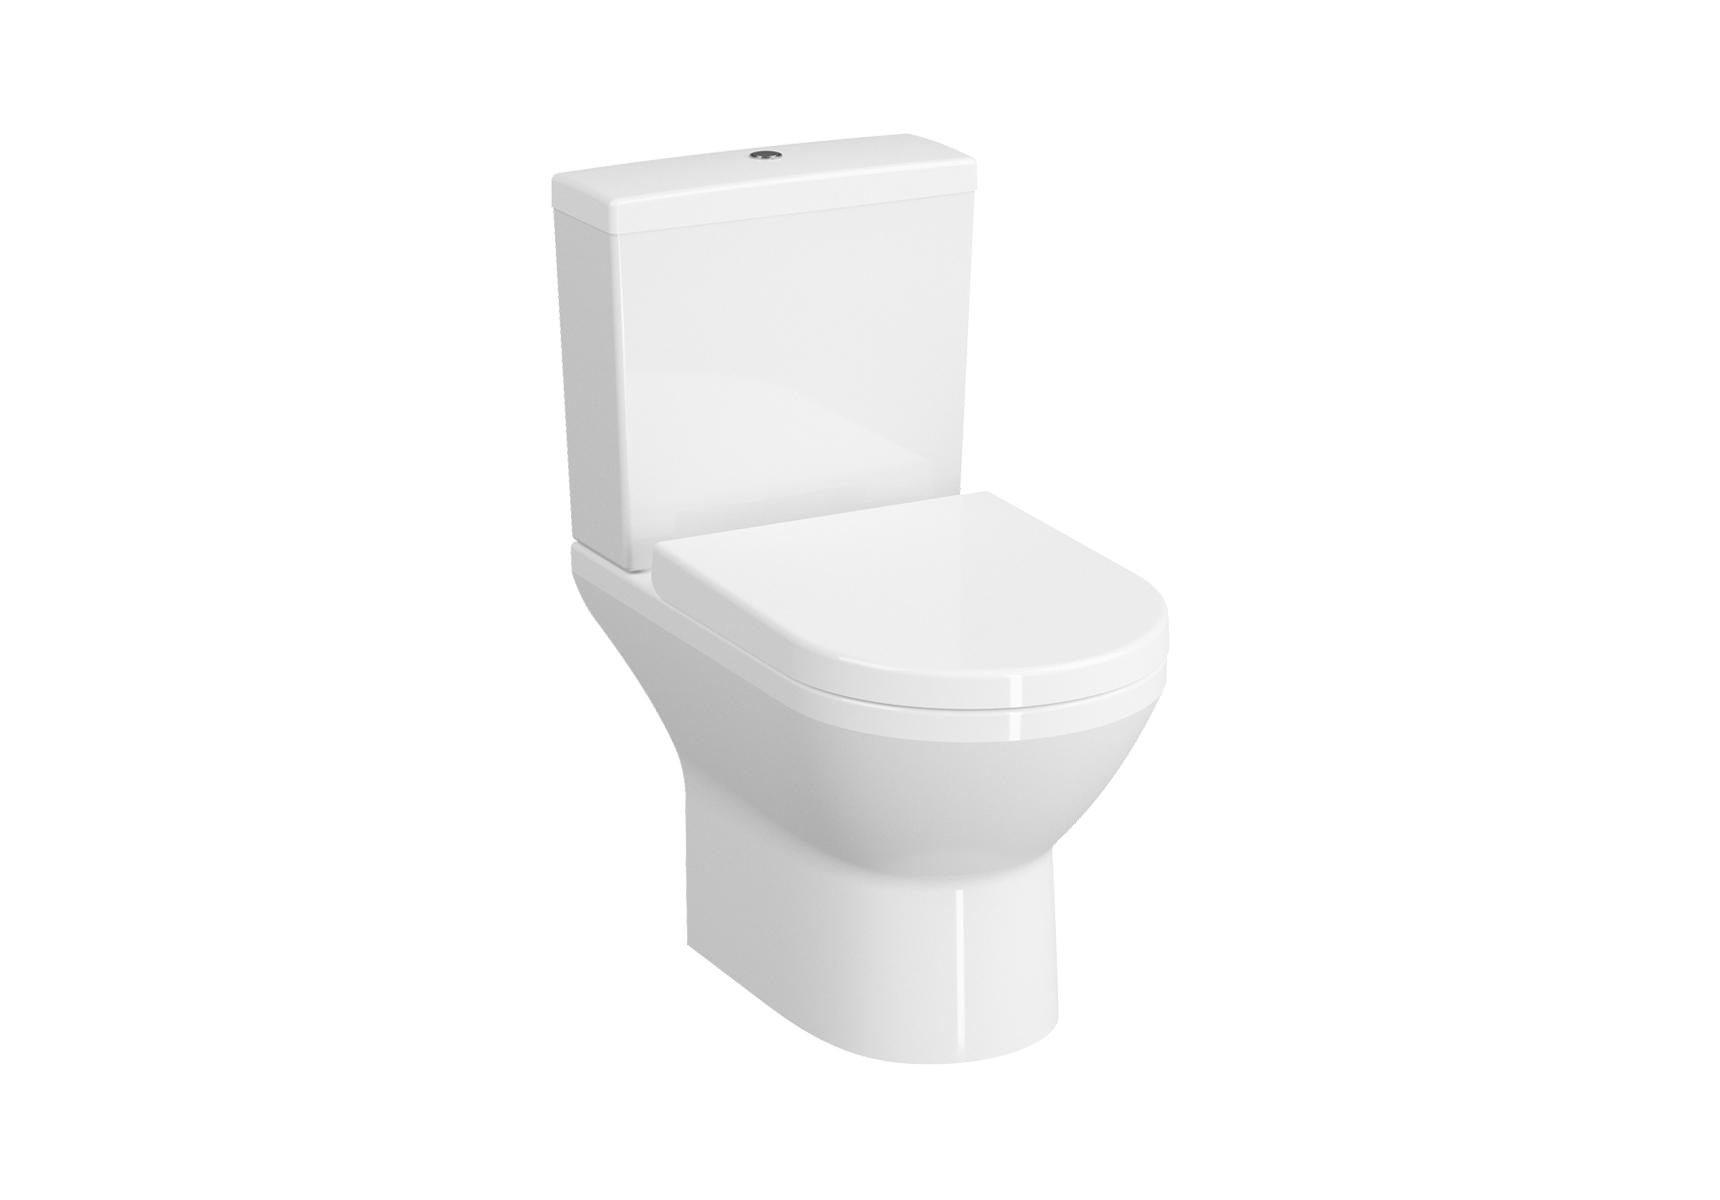 Integra WC open back sans bride, 54 cm